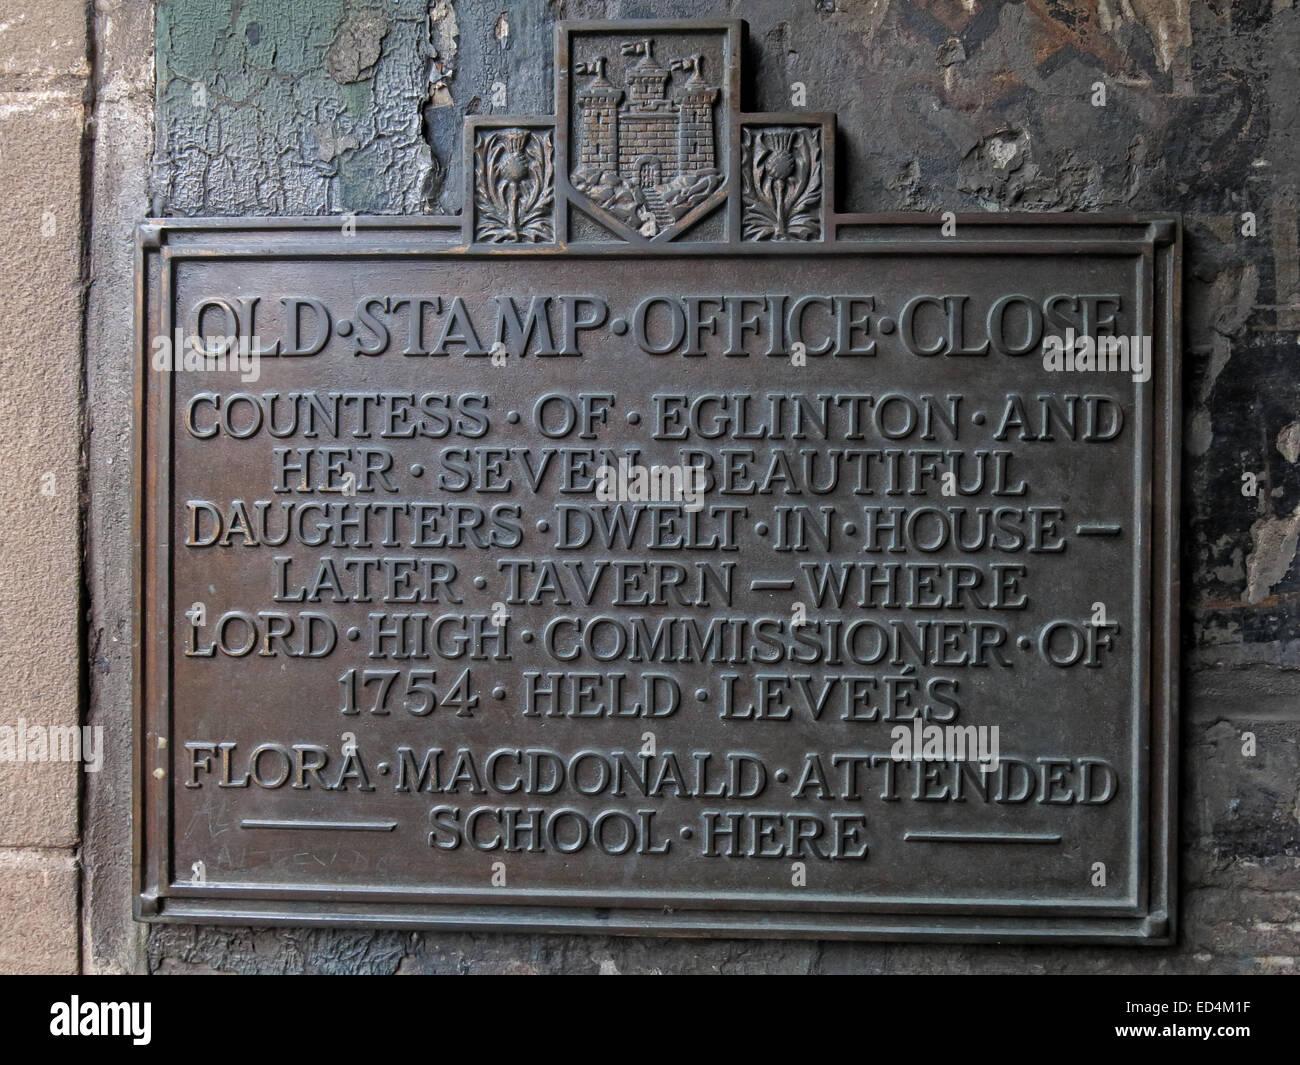 Old Stamp Office Close - detail of plaque, off Royal Mile, Edinburgh City, Scotland, UK - Stock Image